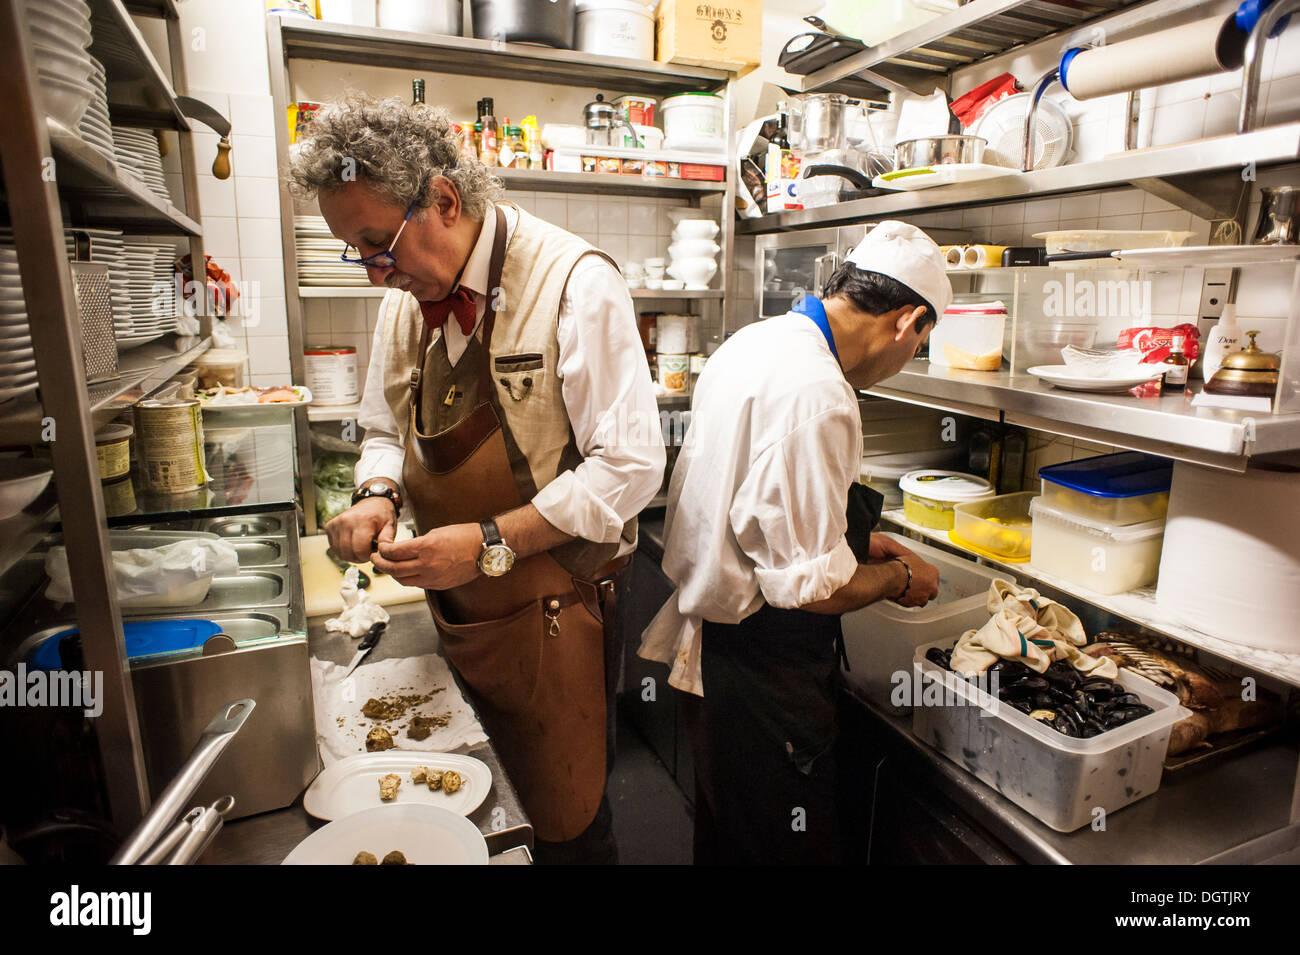 People Working In A Small Professional Kitchen, La Mascareta Restaurant,  Venice, Italy.